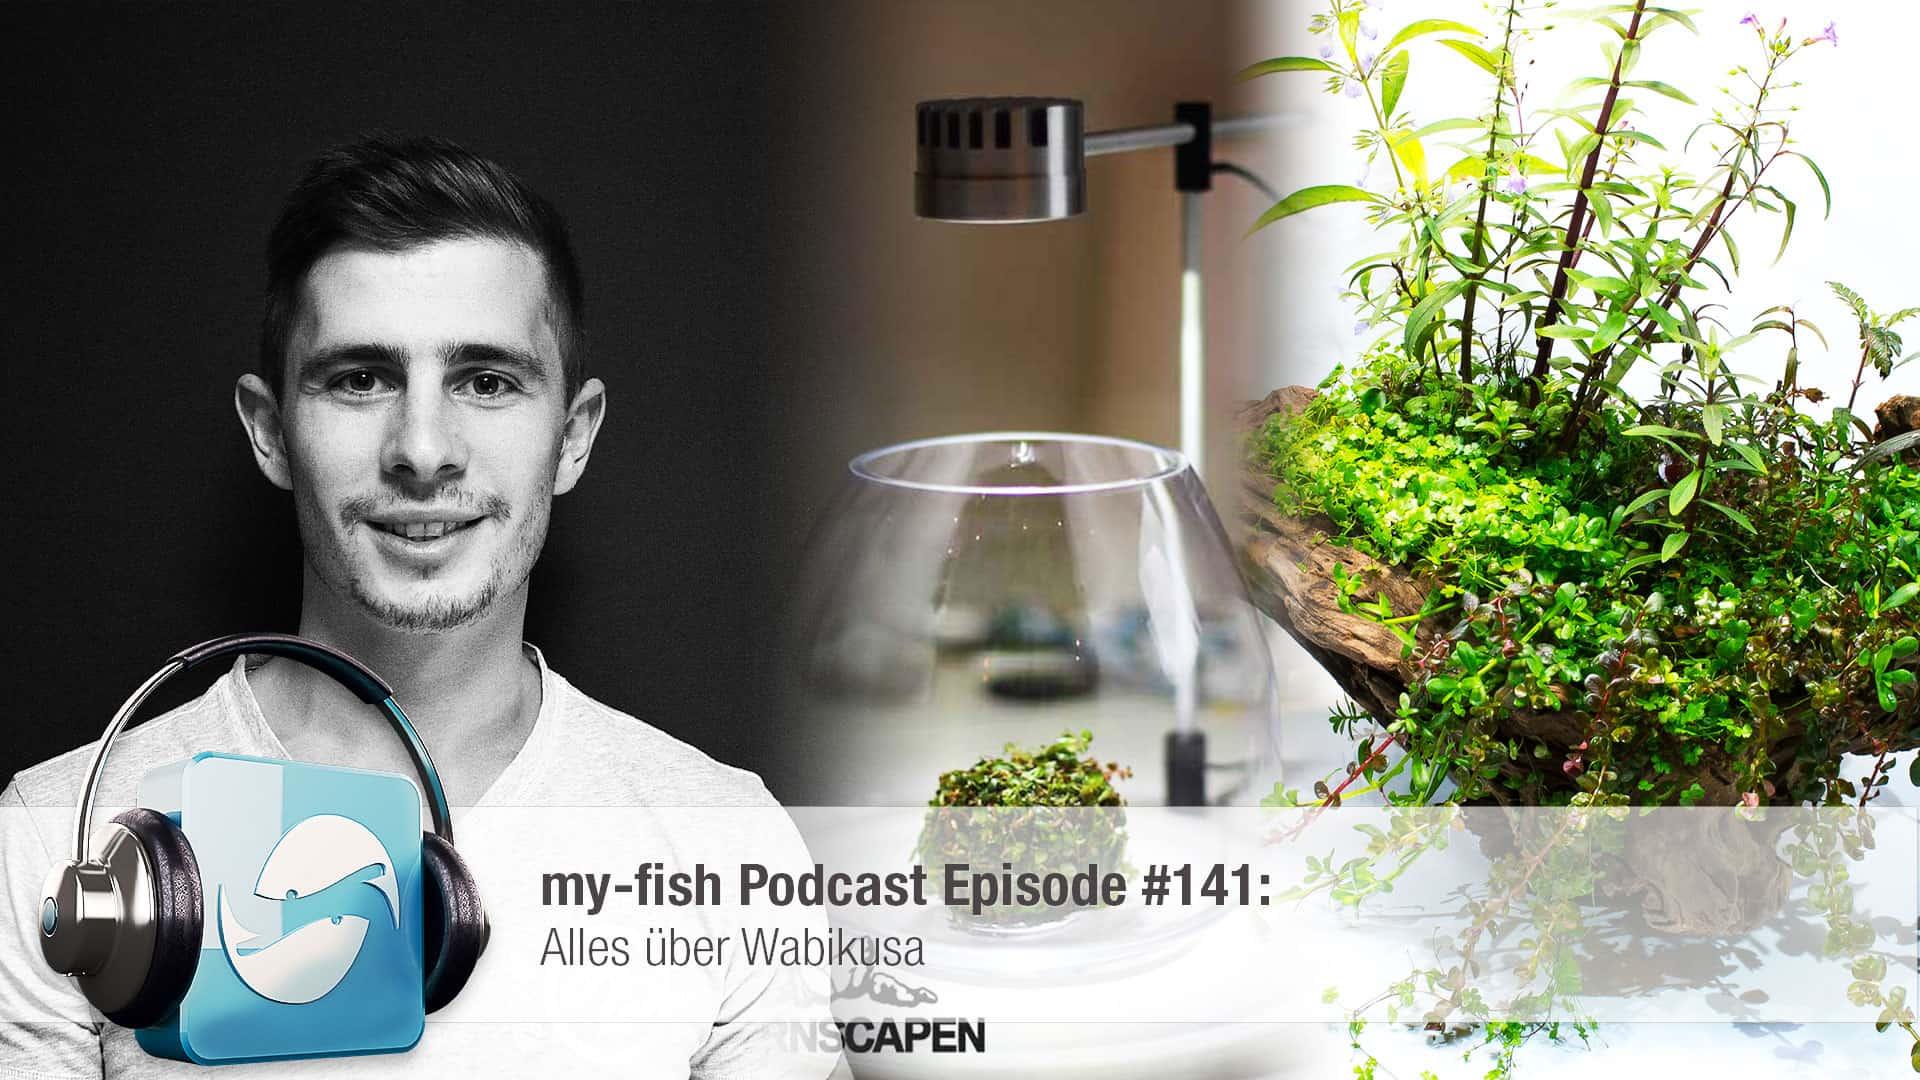 Podcast Episode #141: Alles über Wabikusa 1